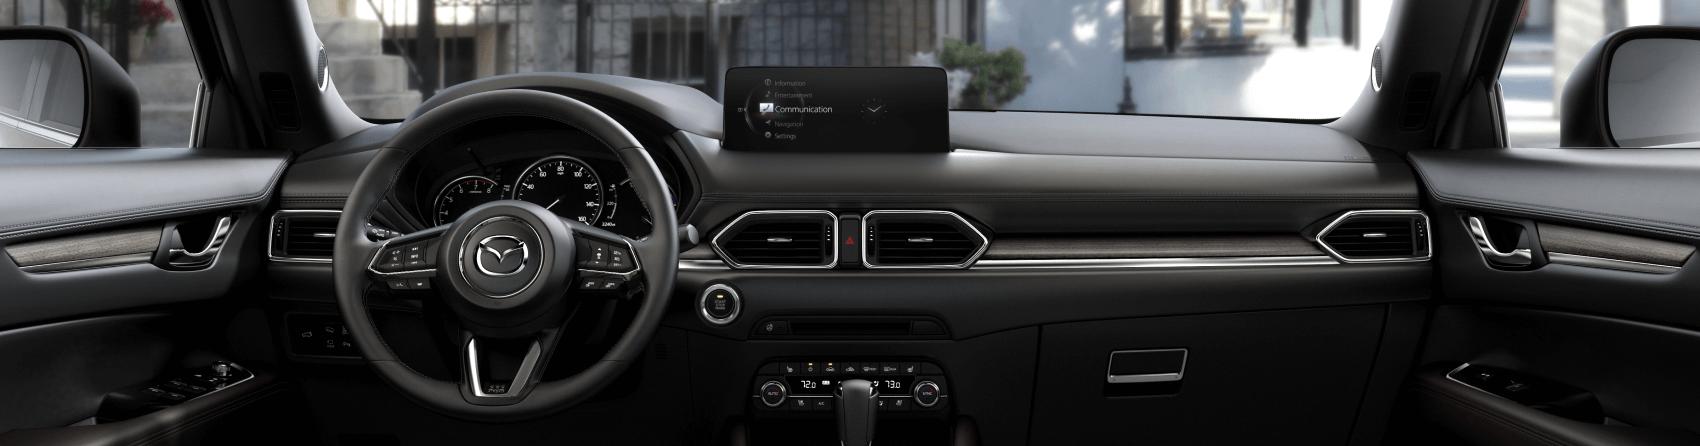 2021 Mazda CX-5 Interior Dashboard Tech Ocean Mazda